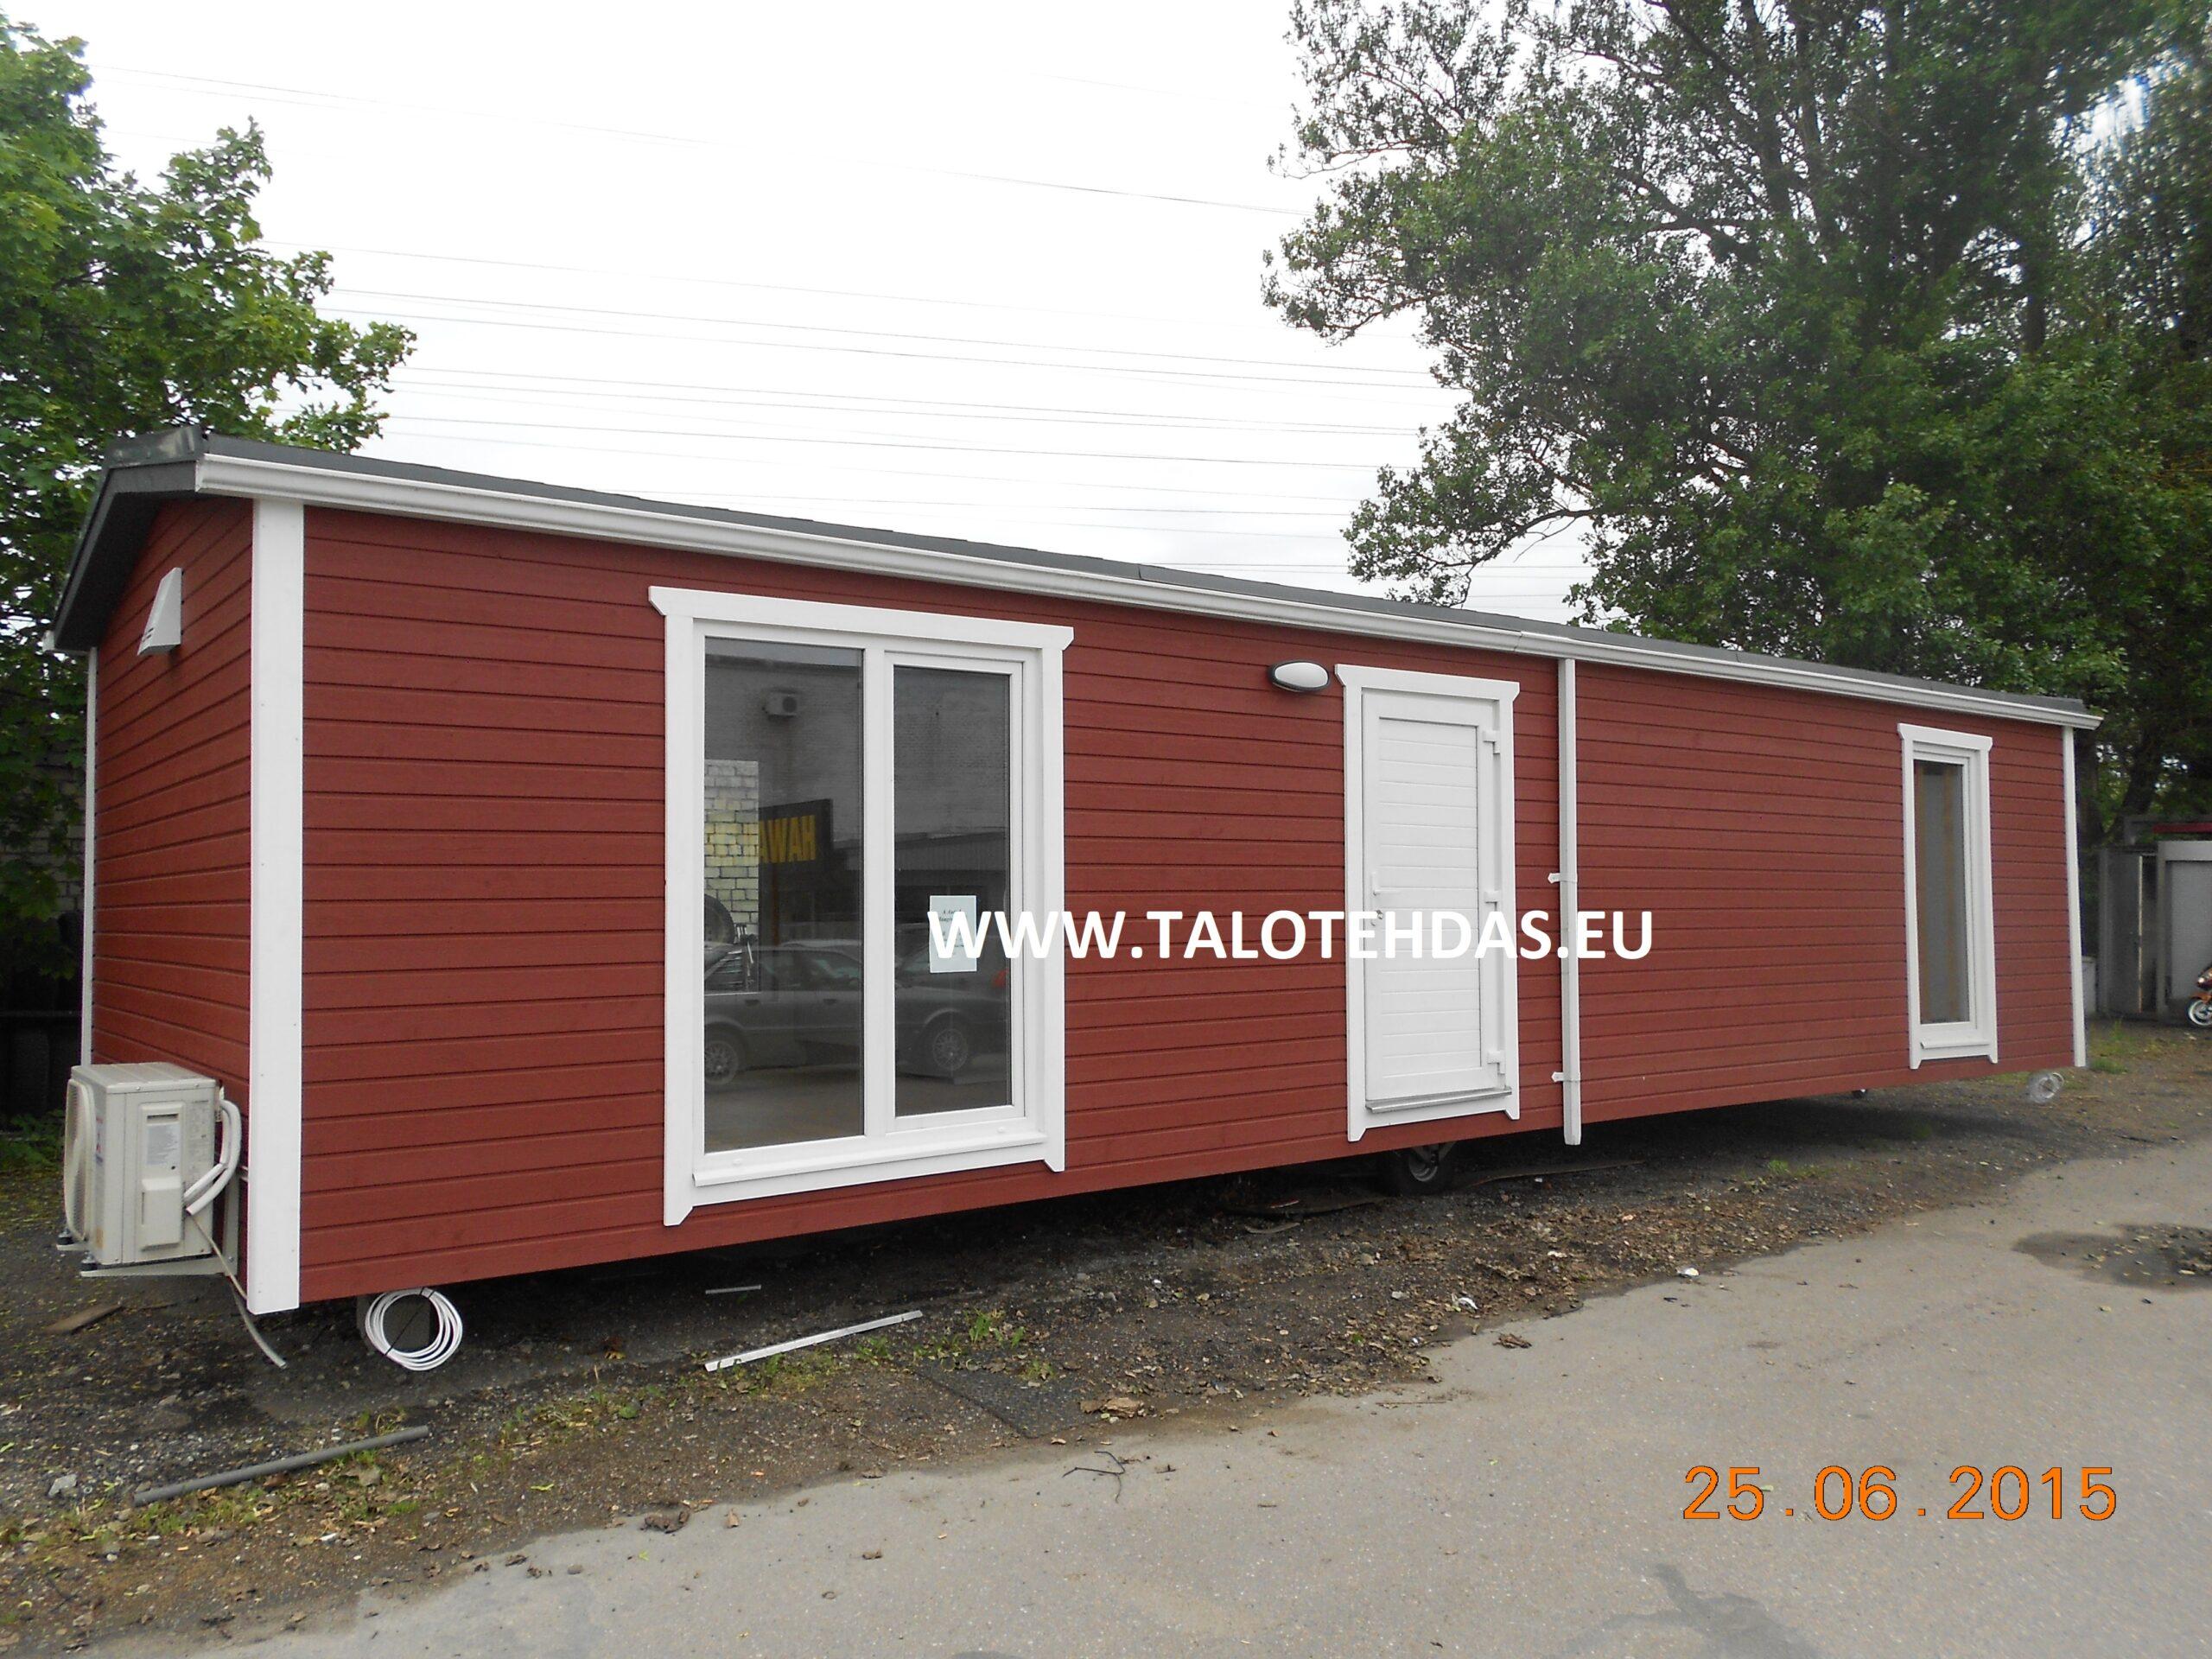 Talotehdas, talovaunu virosta, talovaunu